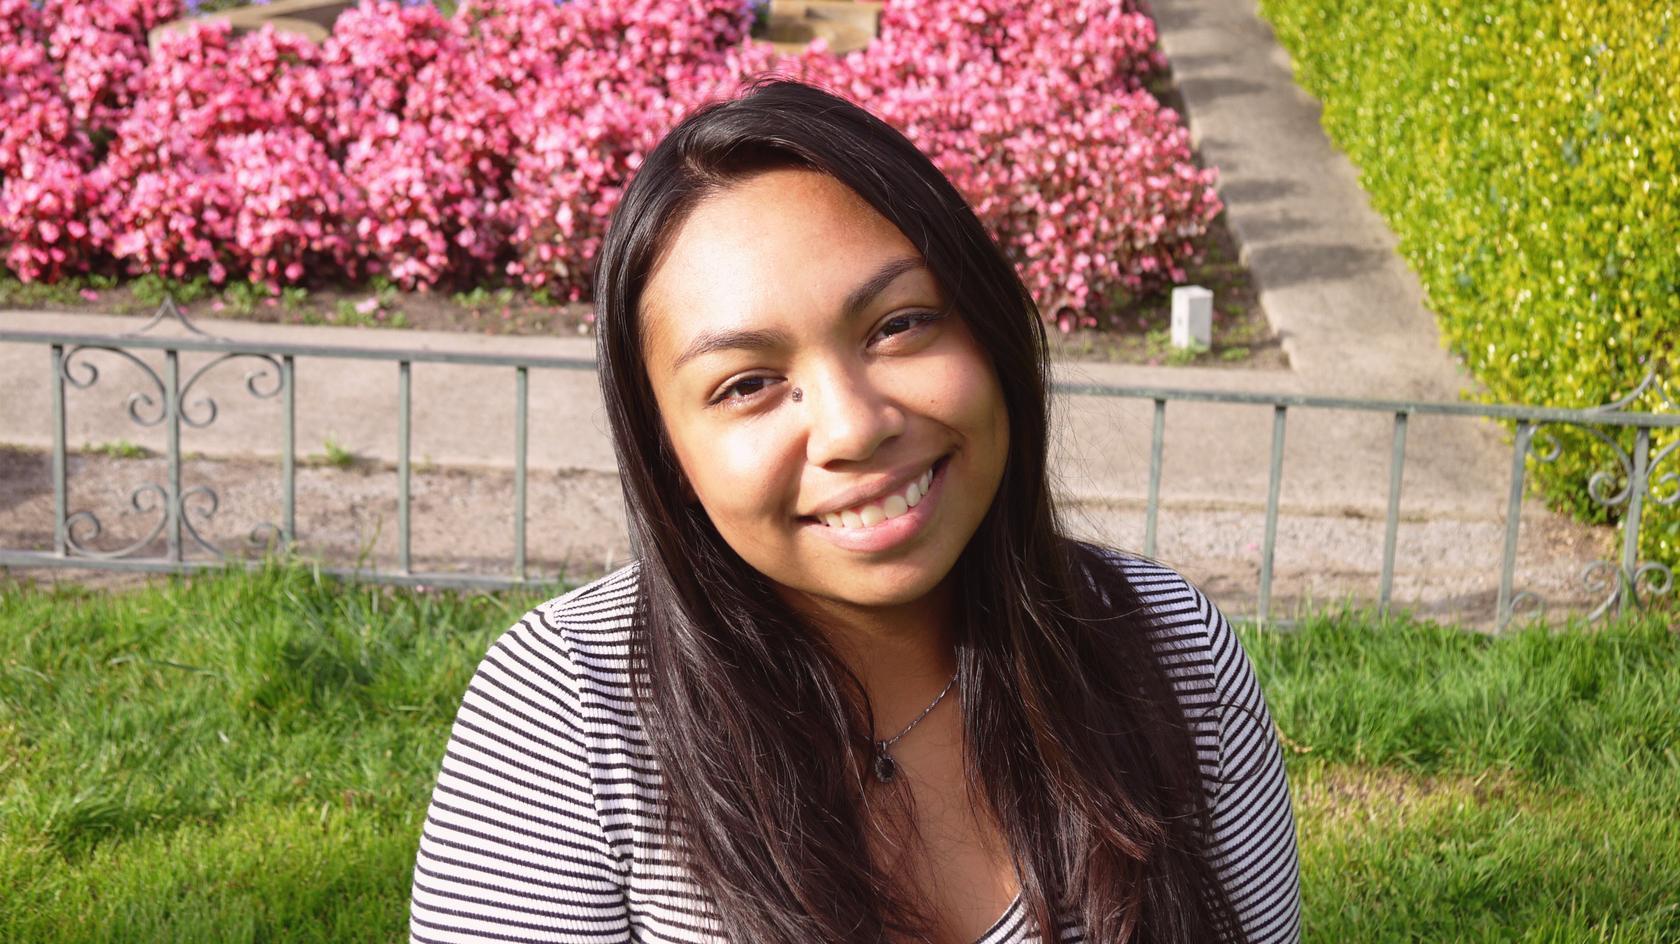 Sophie Calzada